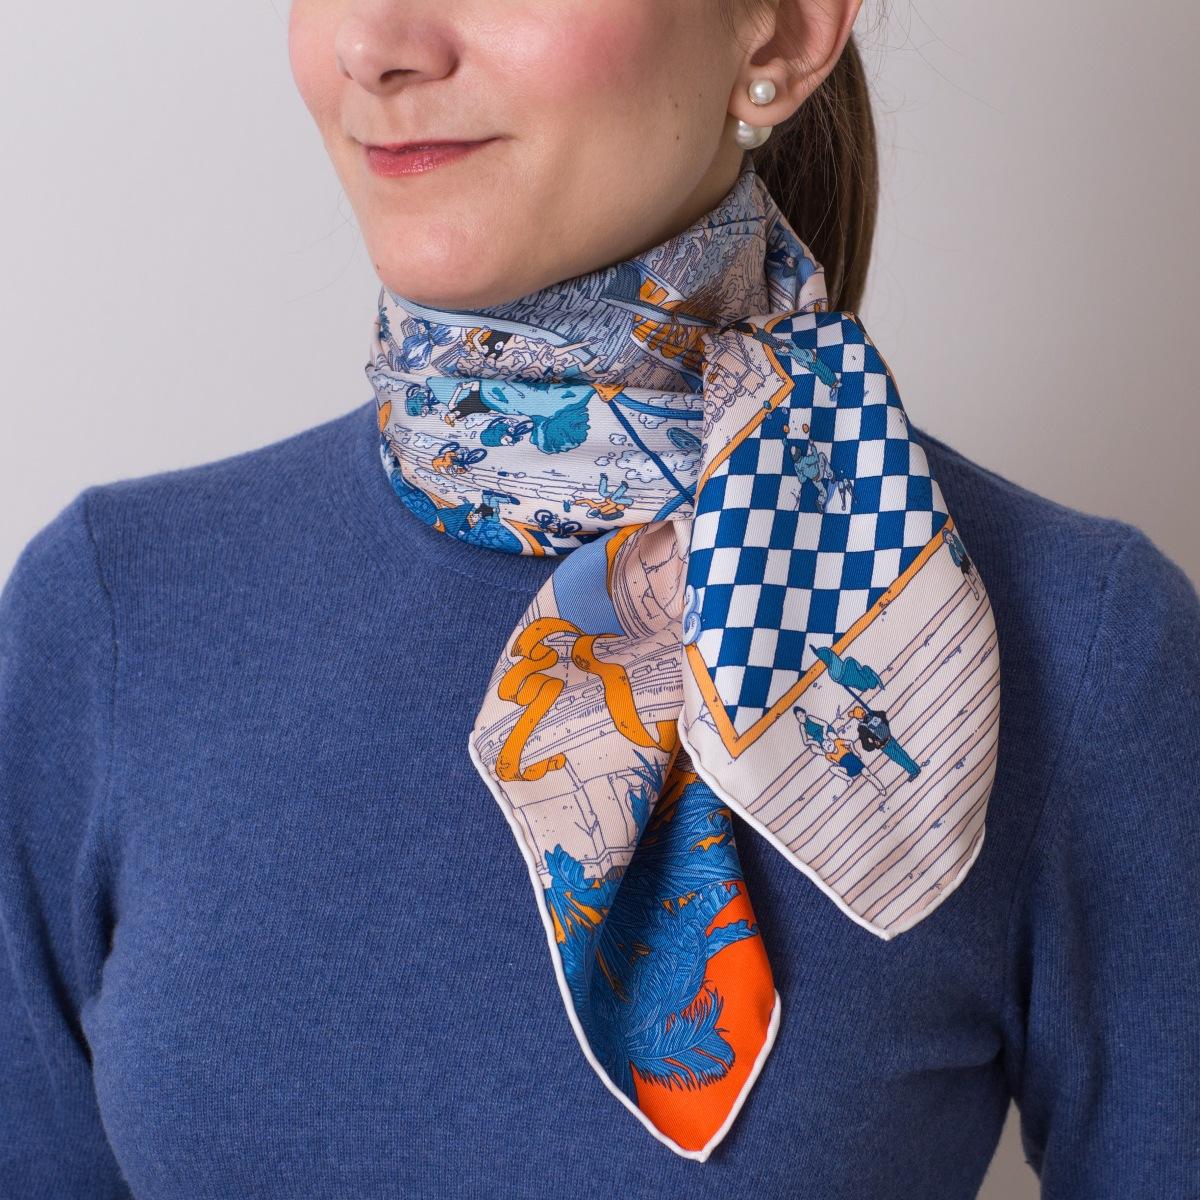 Le Grand Prix du Faubourg, Ugo Gattoni, Hermes scarf, carre, knot, knotting, tutorial, hermes carre, Hermes Schal, эрмес, платок, карре, как красиво завязать платок, how to wear a scarf